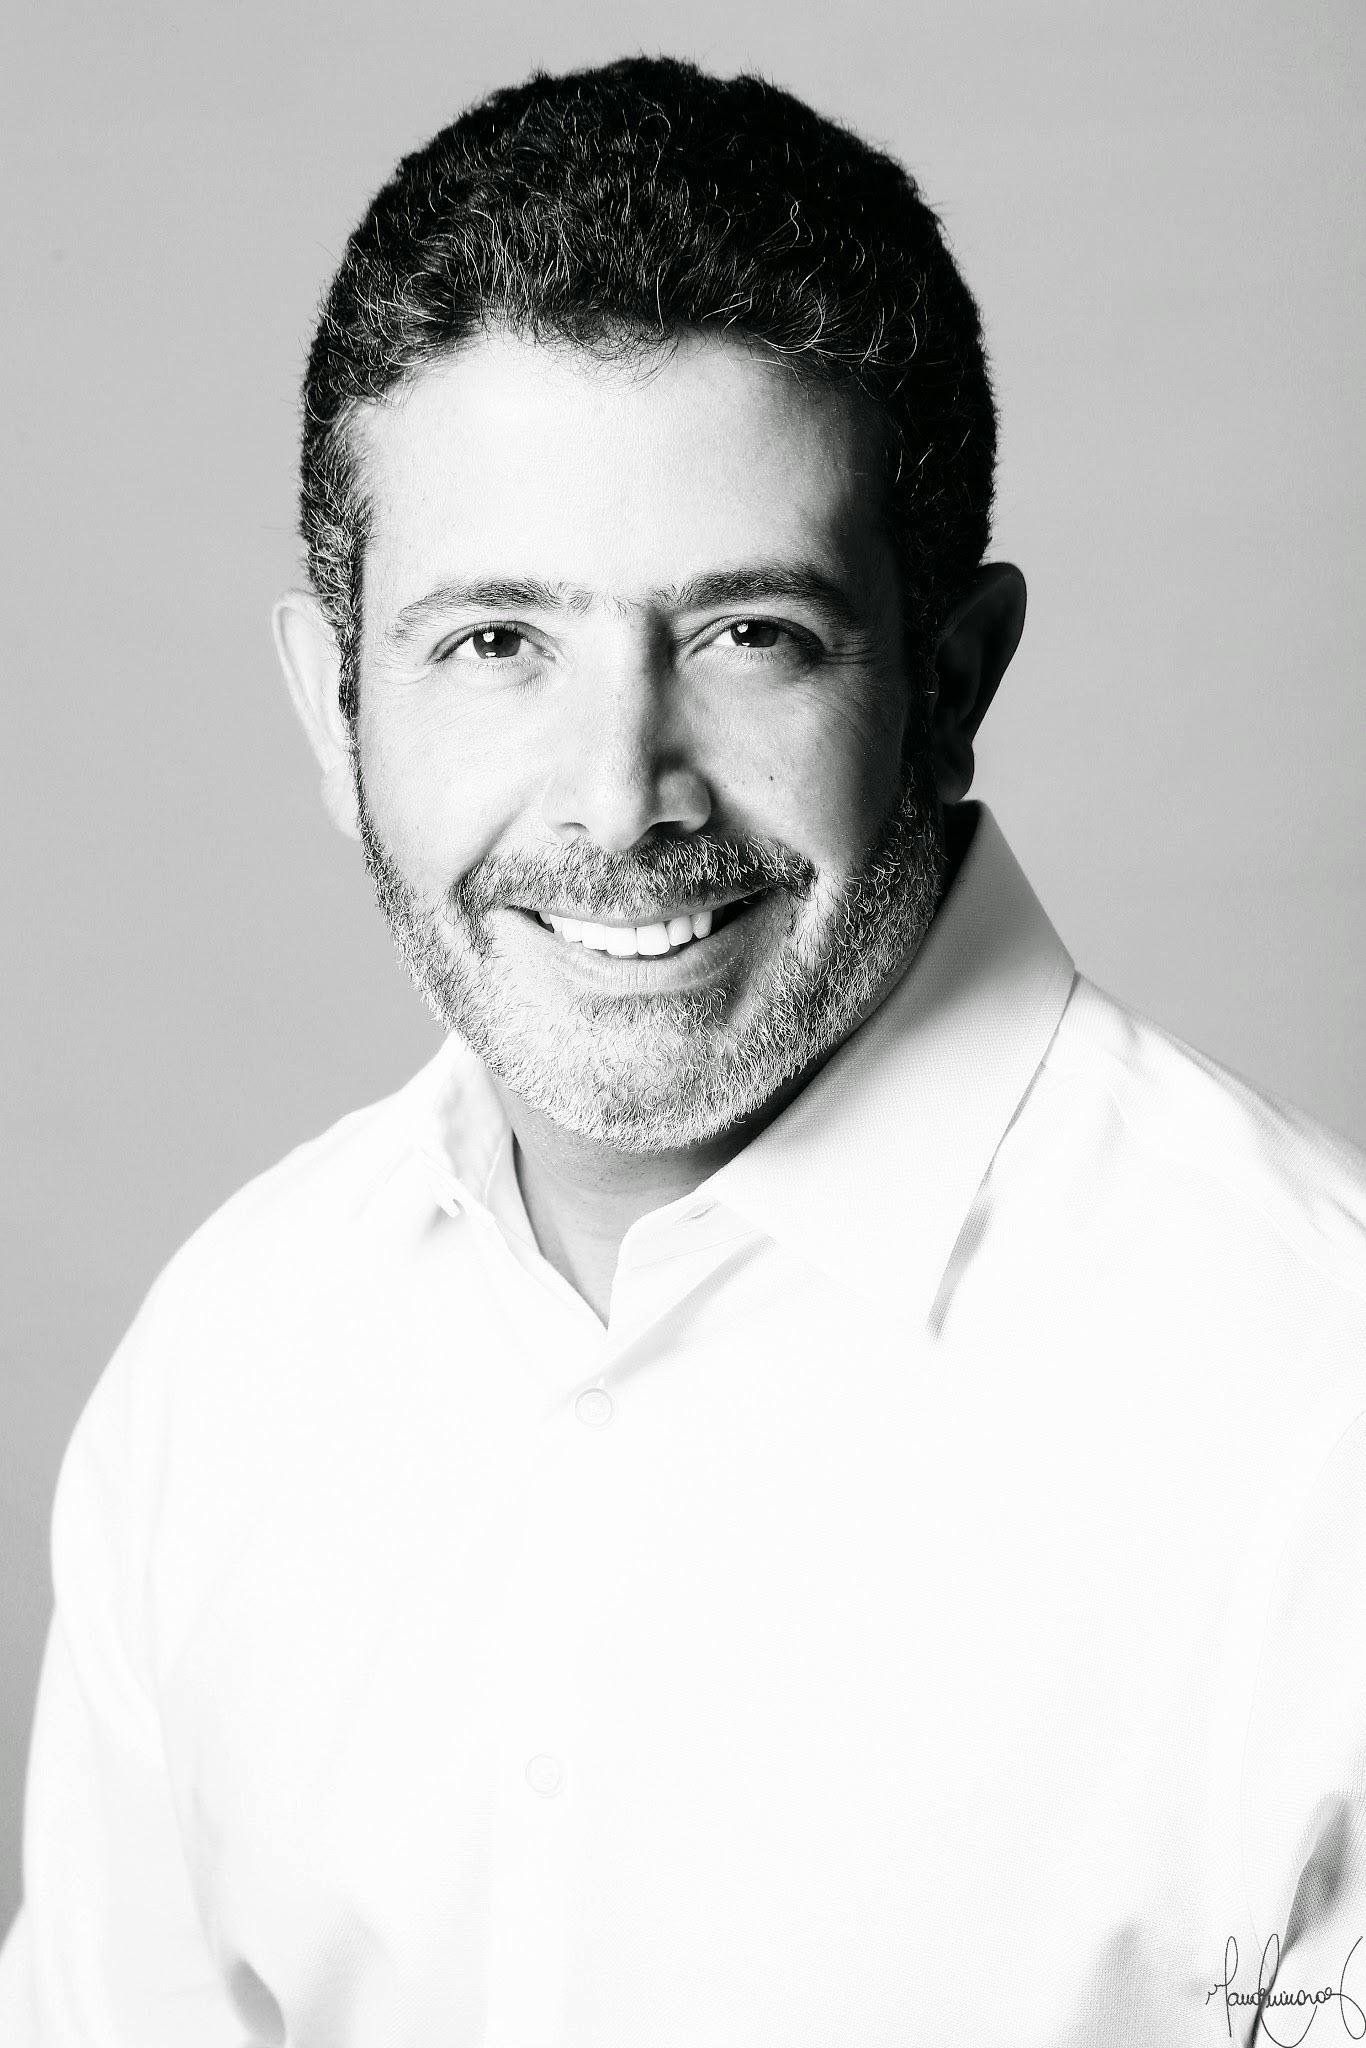 Flávio Niemeyer Guimarães